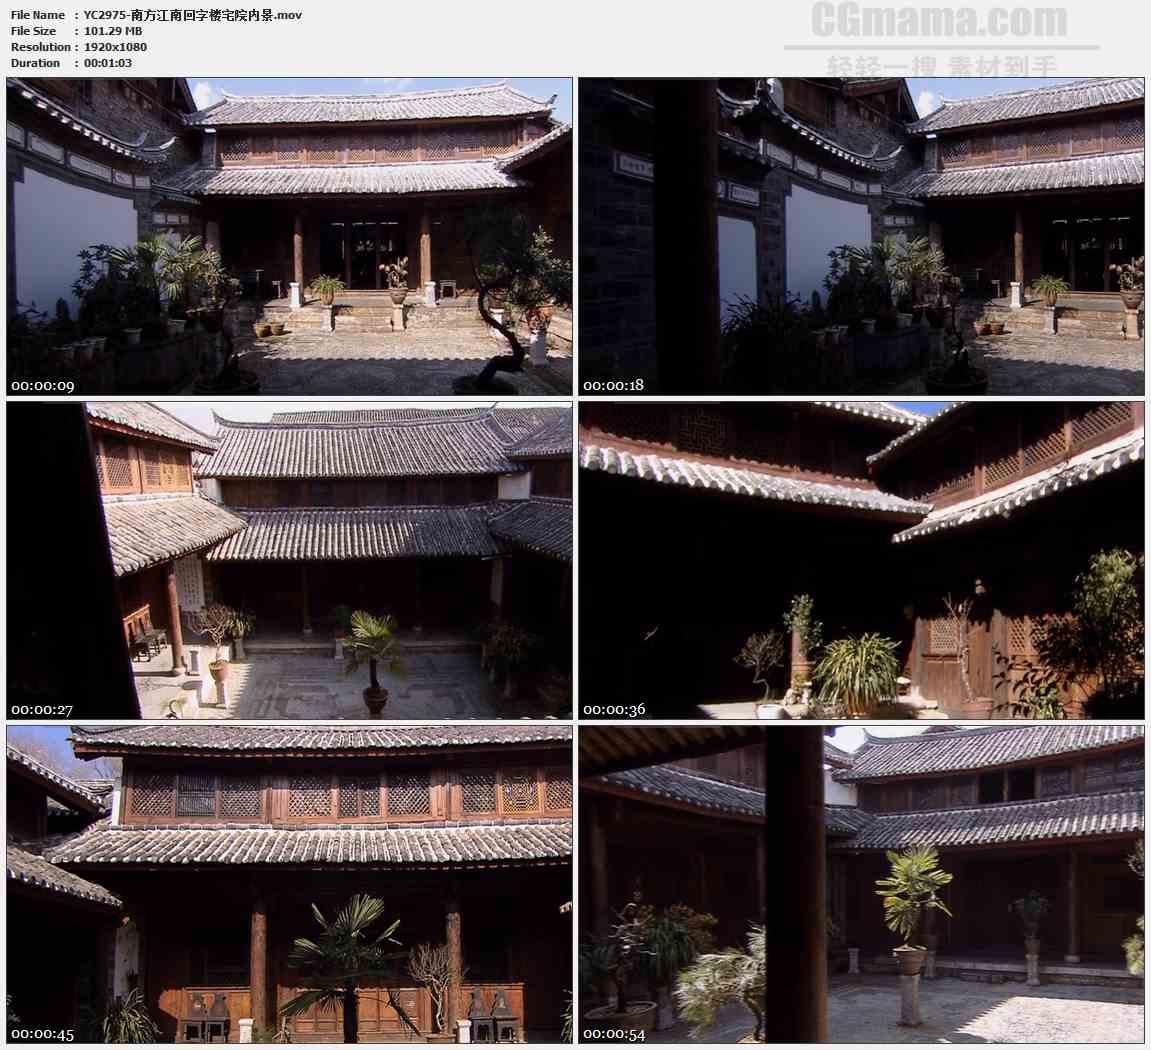 YC2975-南方江南回字楼宅院内景高清实拍视频素材